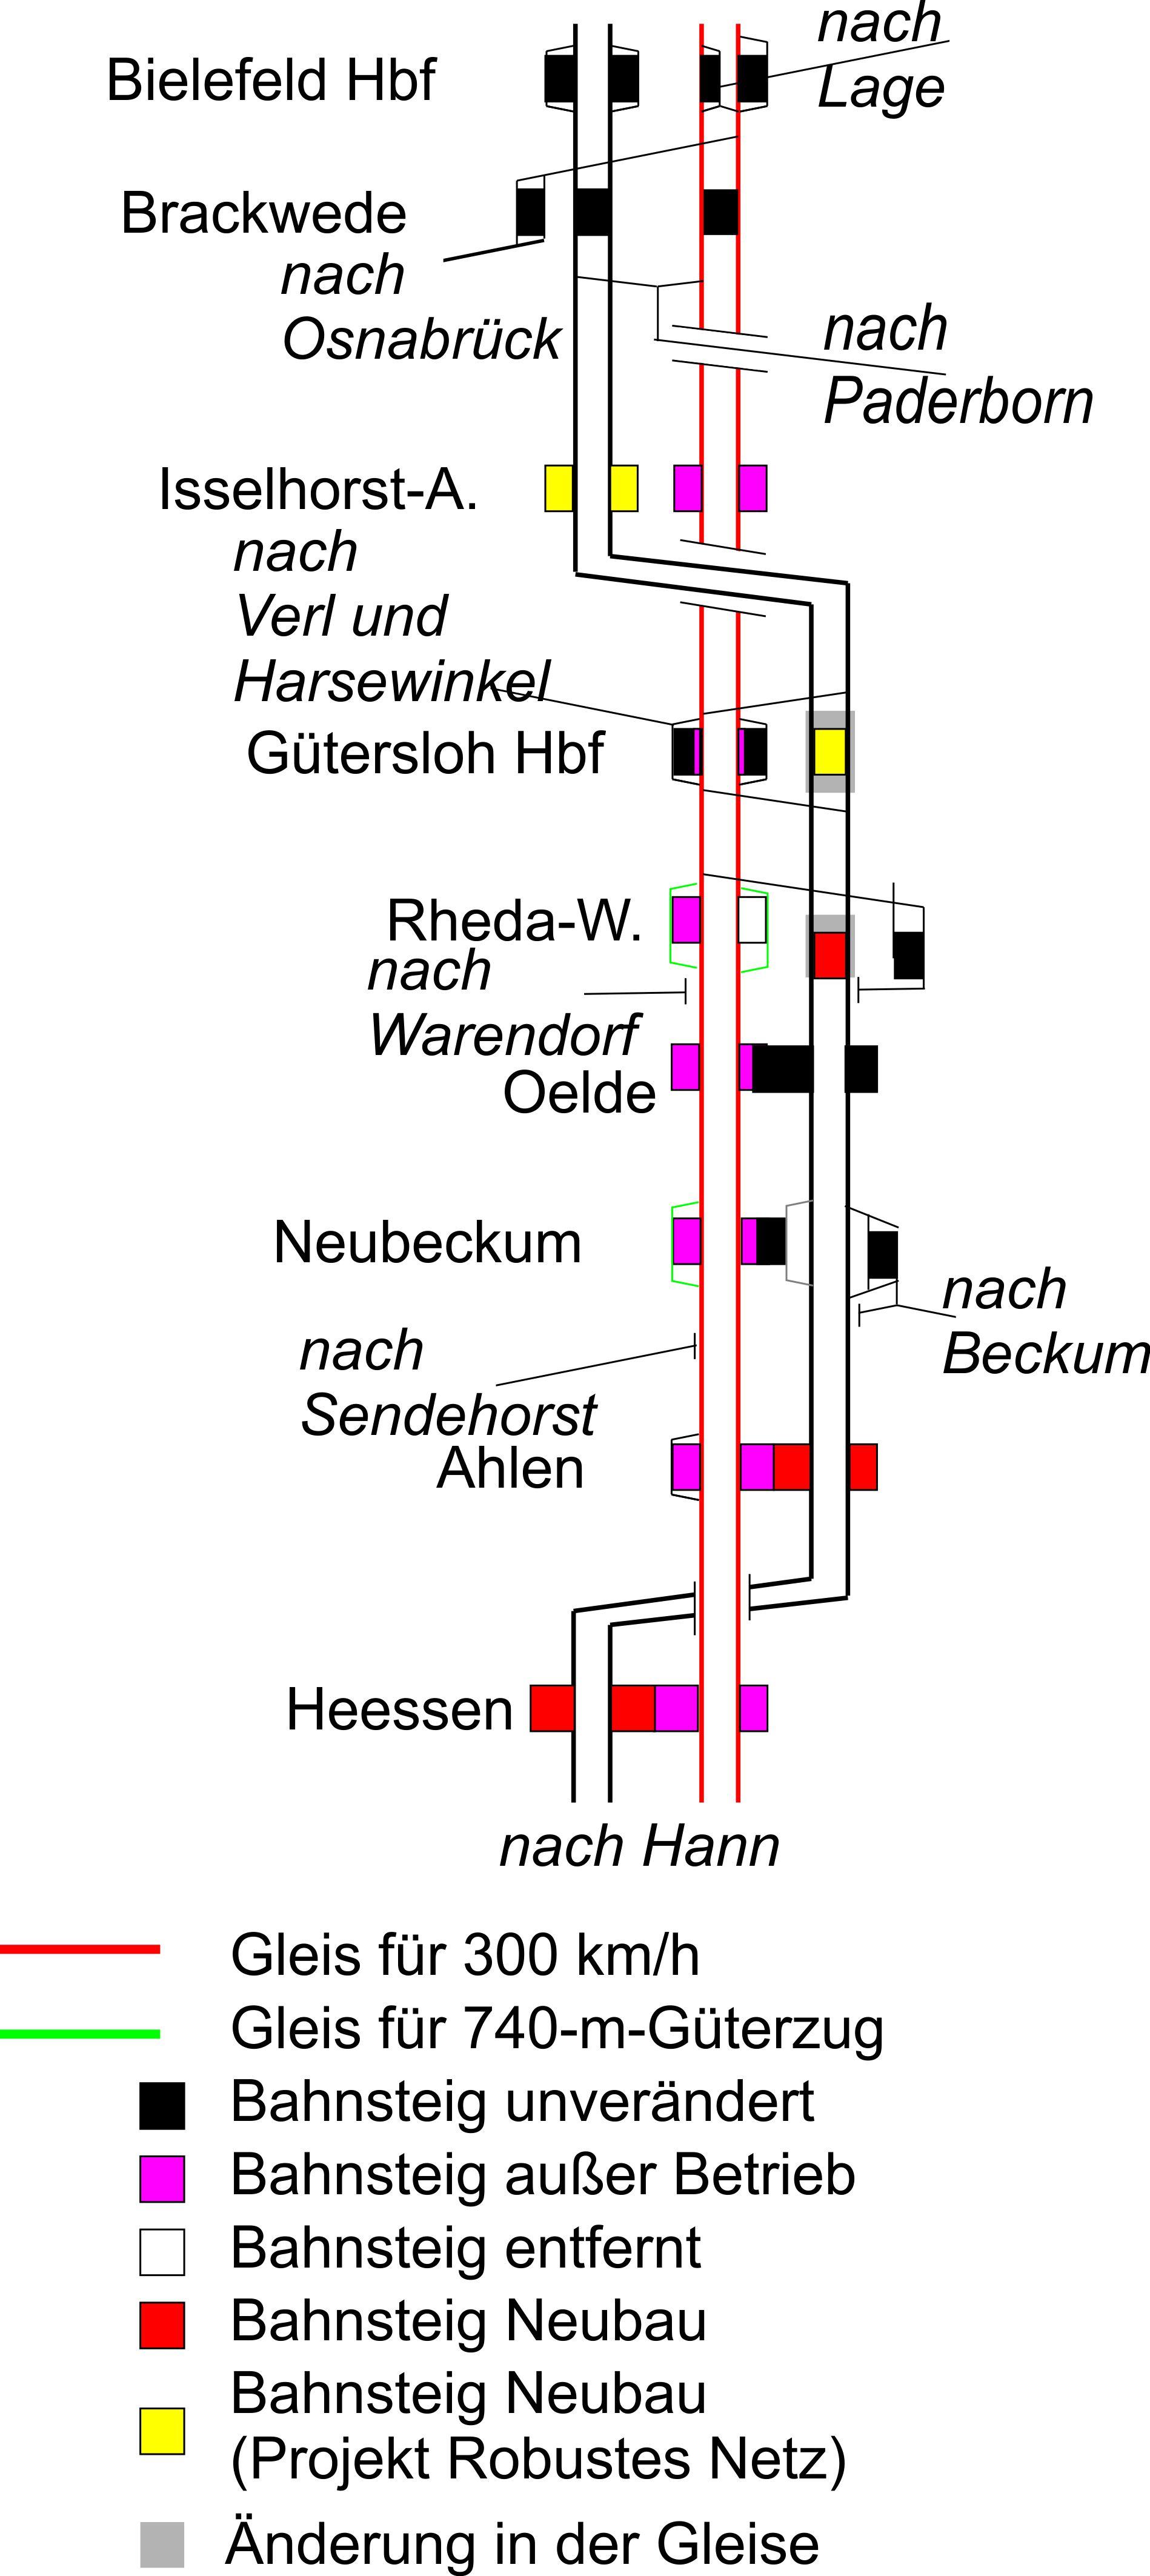 Gleiaplan Bielefeld - Hamm